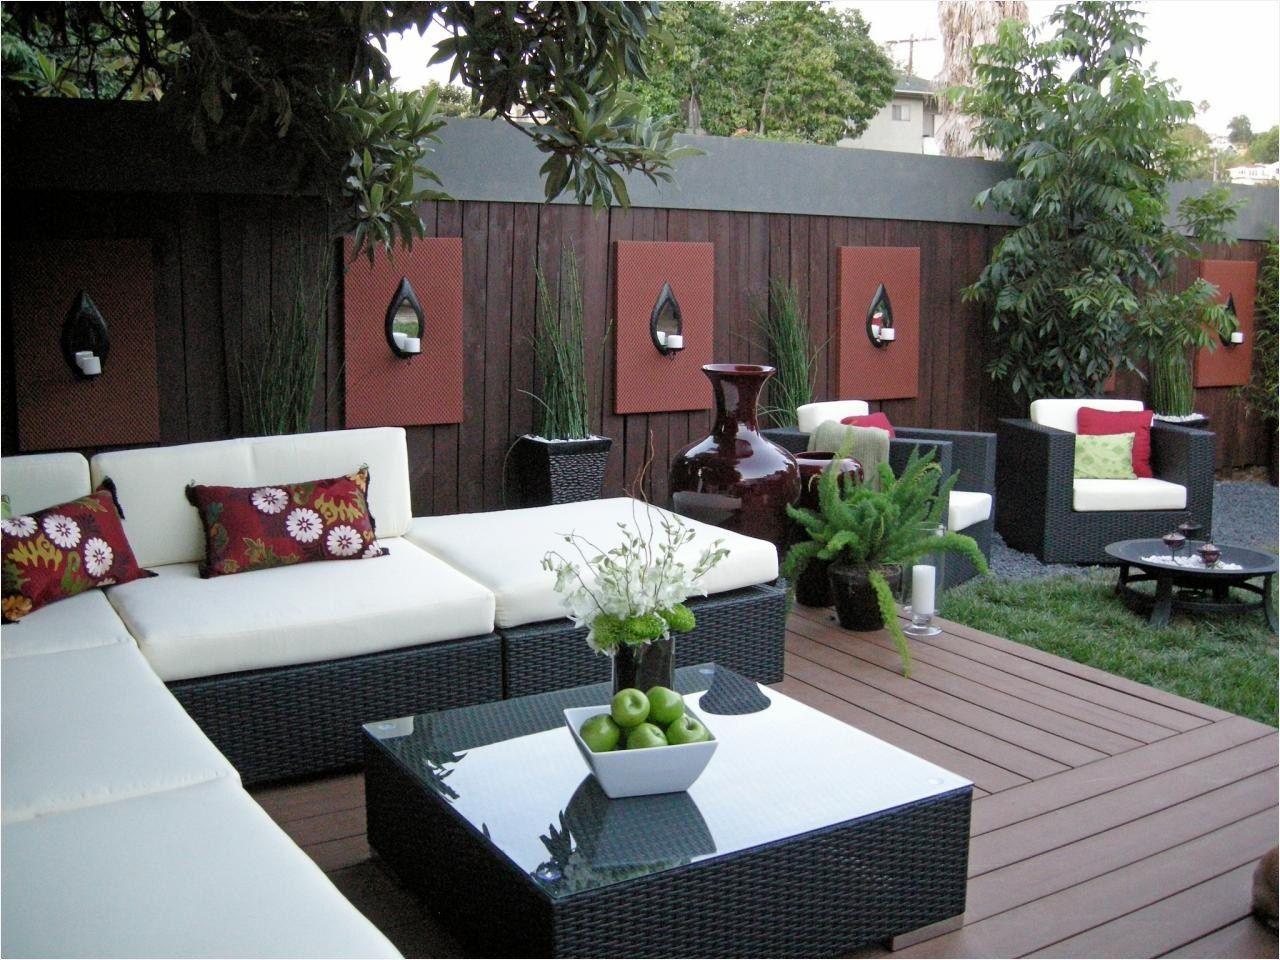 stunning courtyard interior wall decorating ideas on modern deck patio ideas for backyard design and decoration ideas id=49437